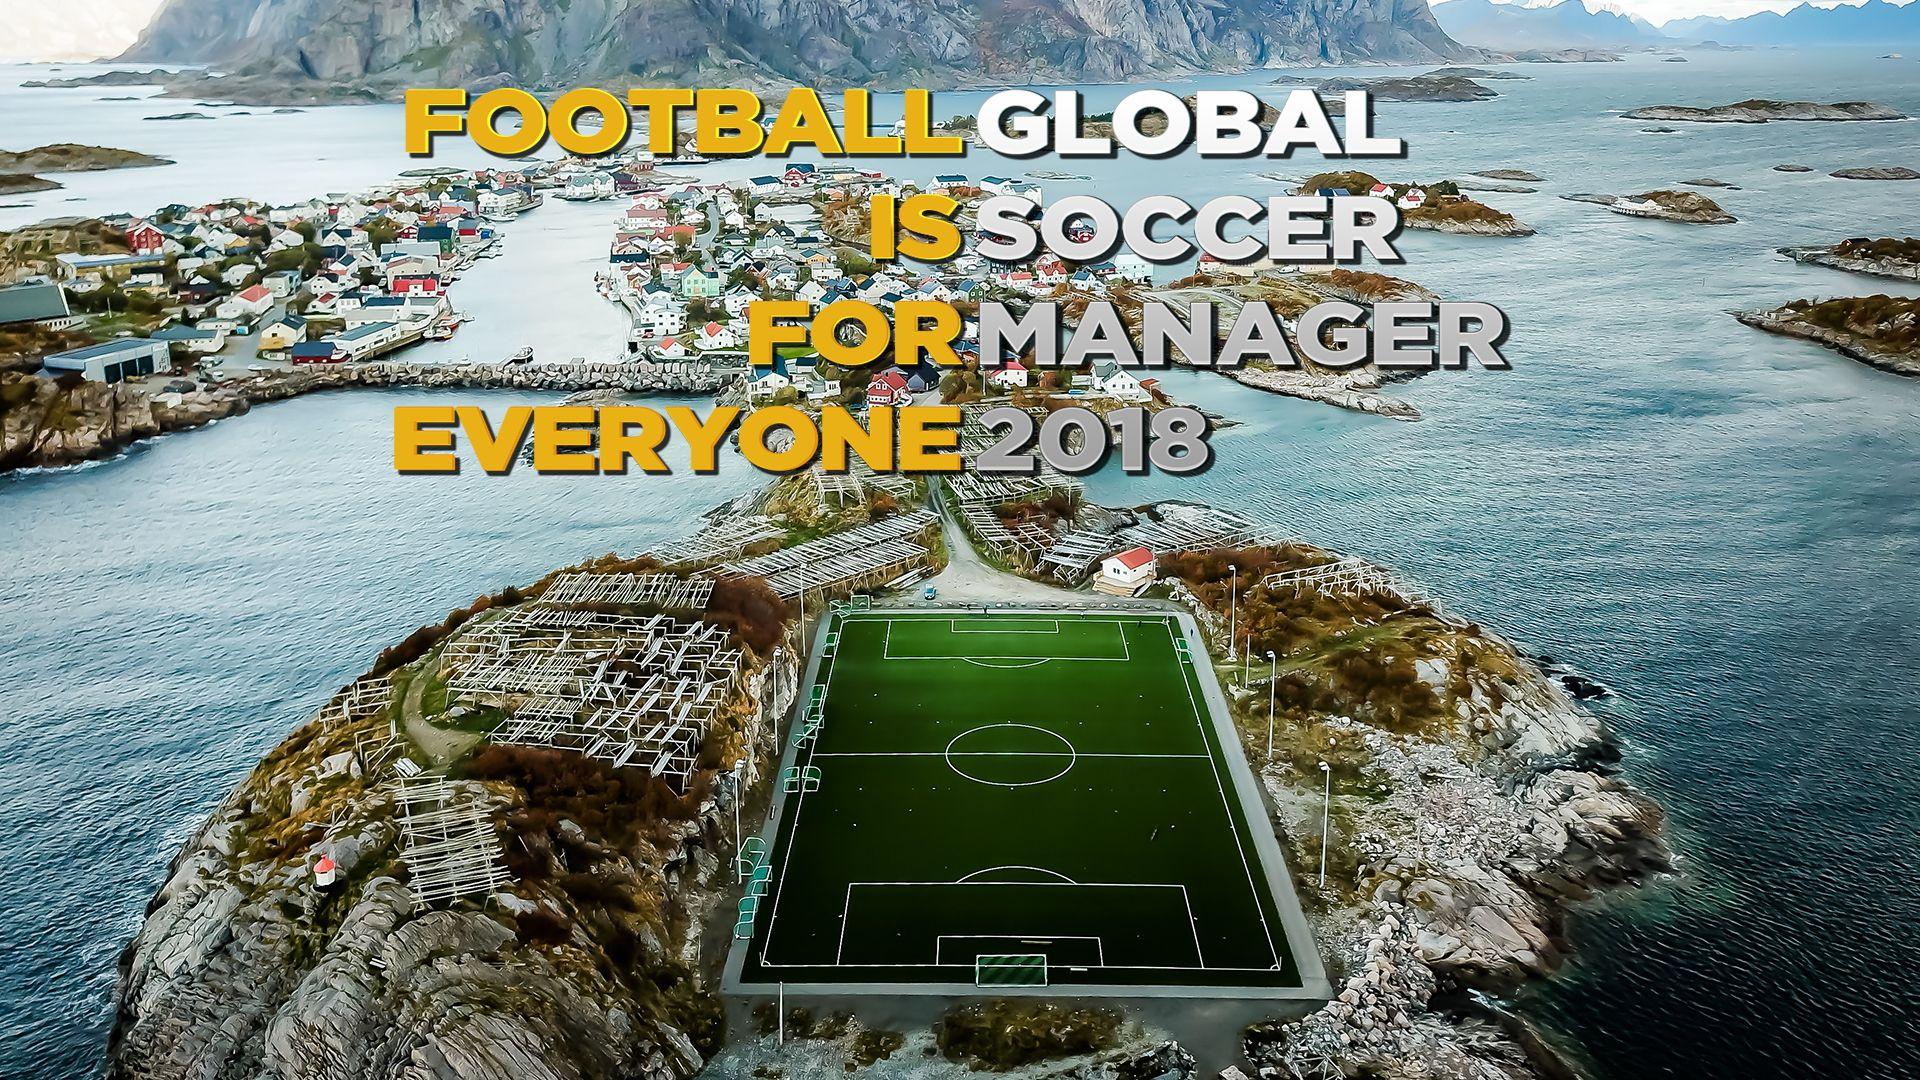 Global Soccer Manager 2018